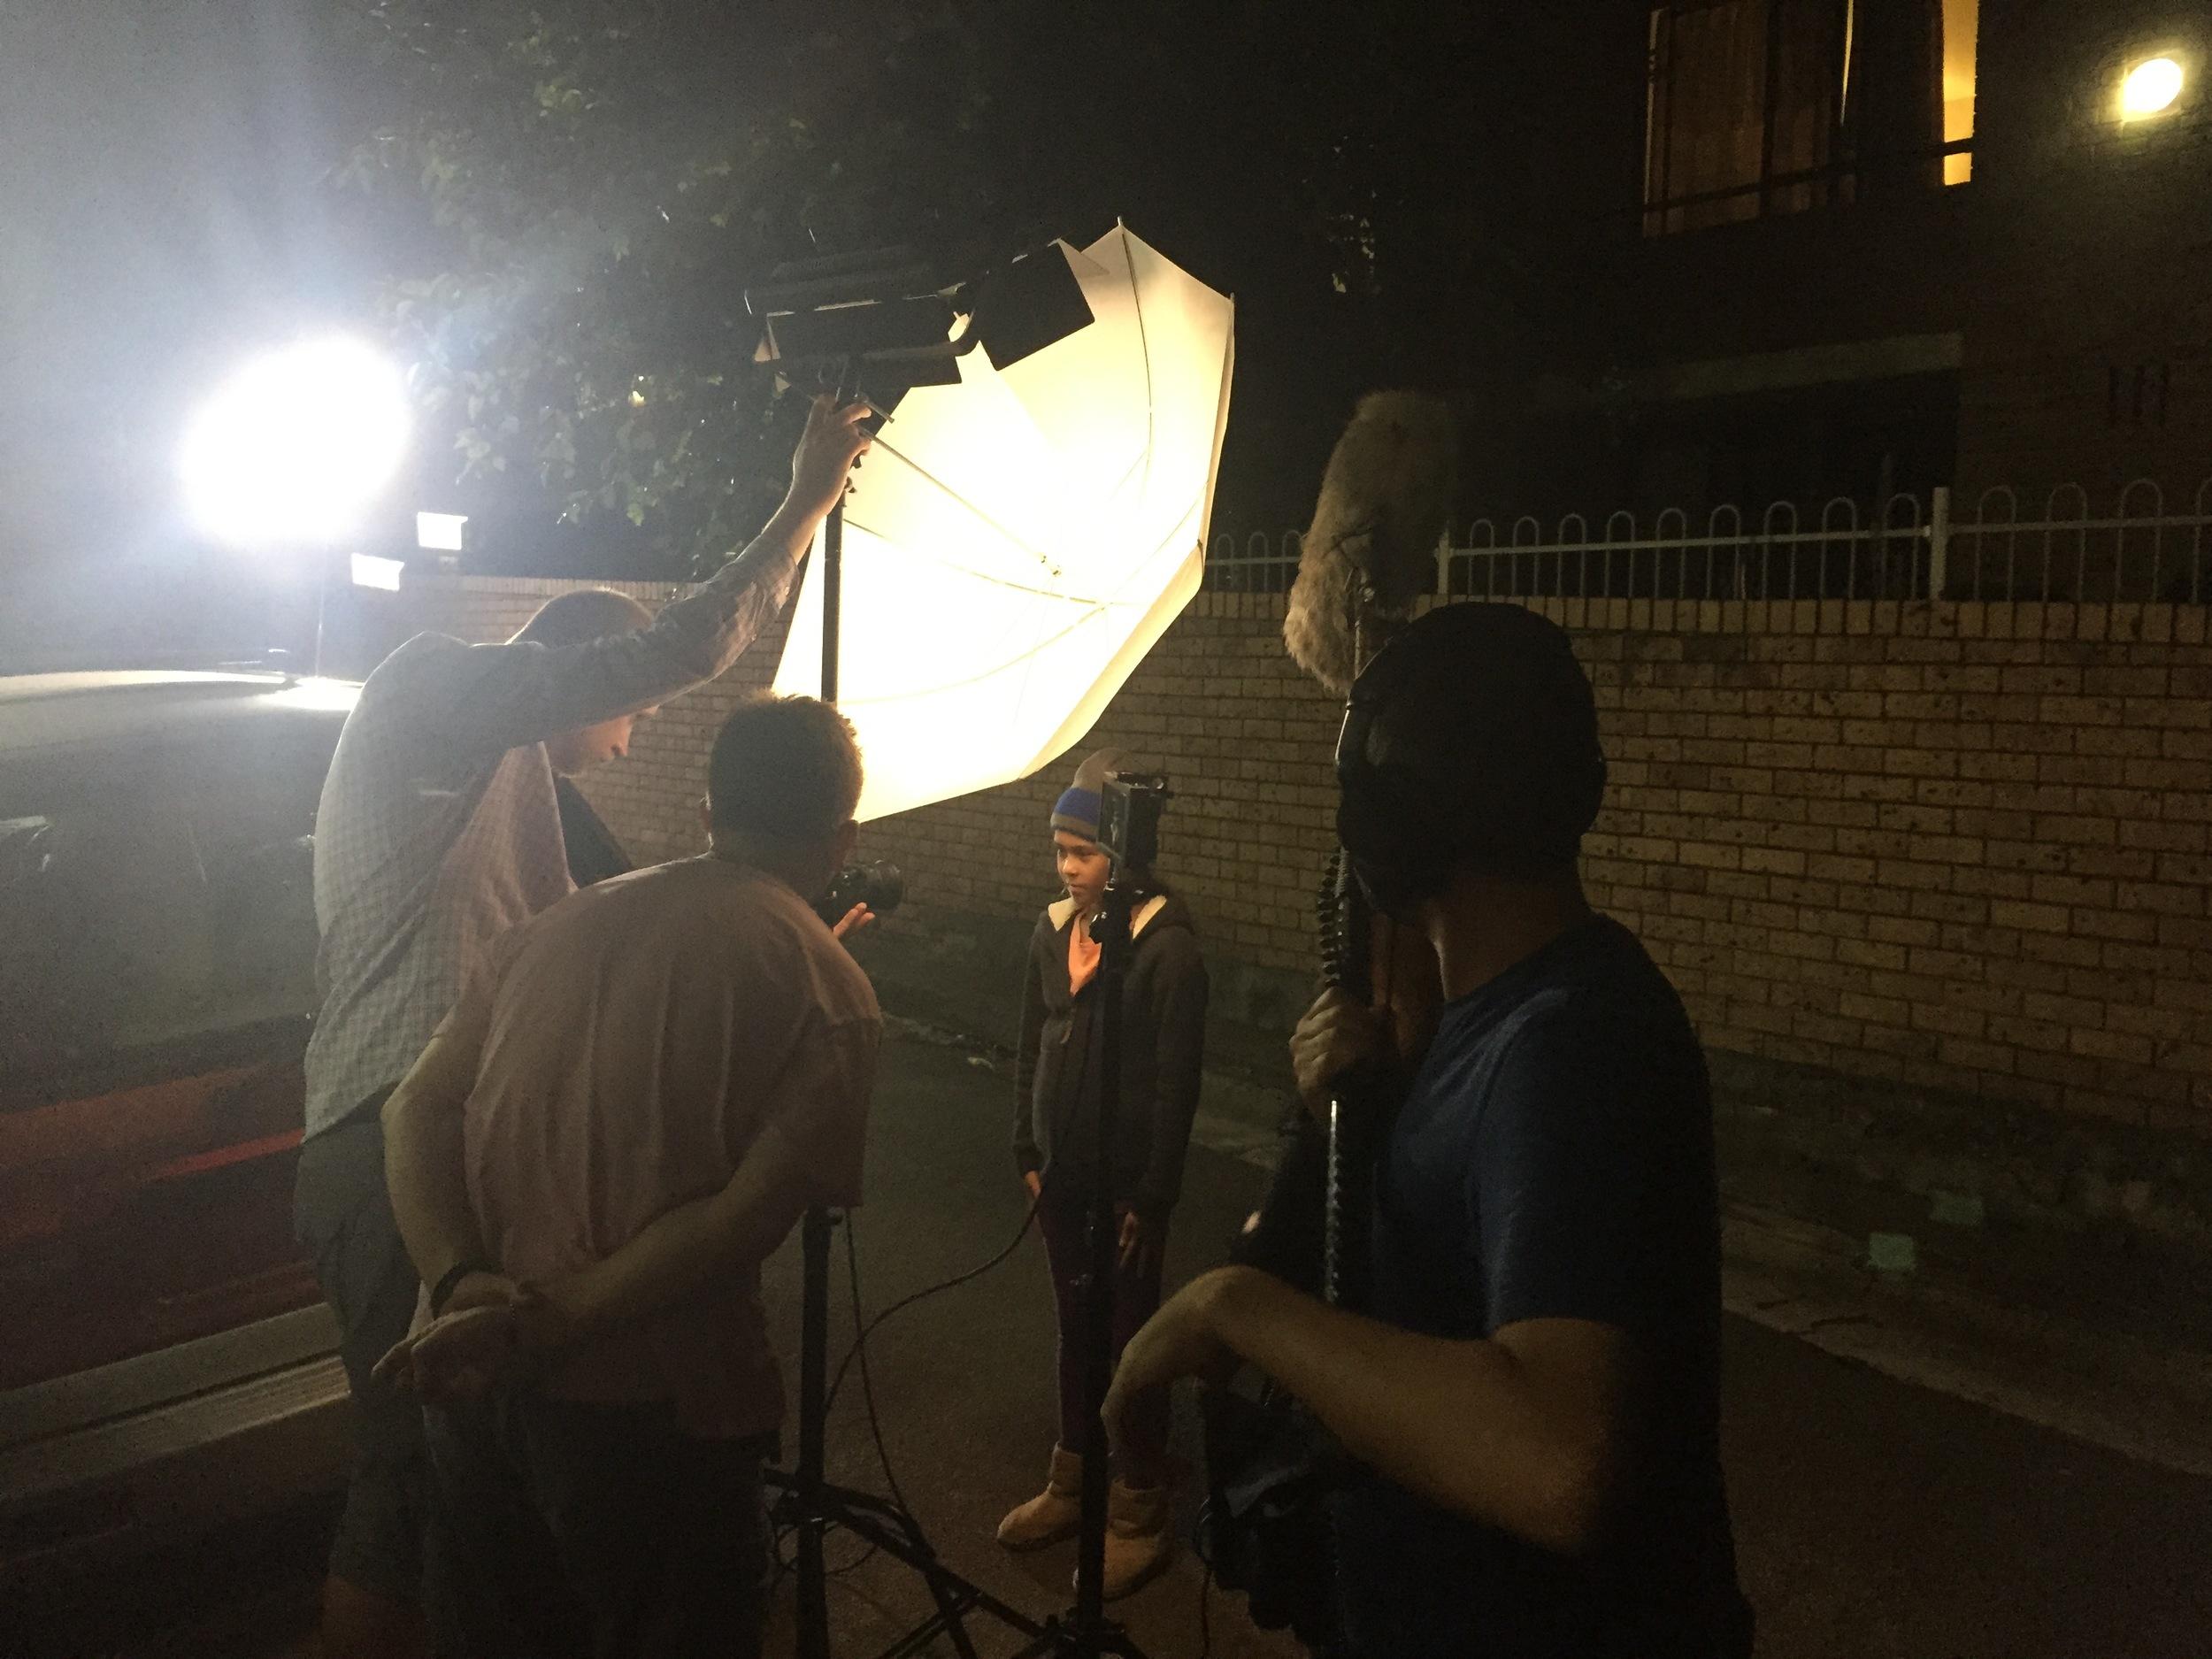 Last scene of the shoot